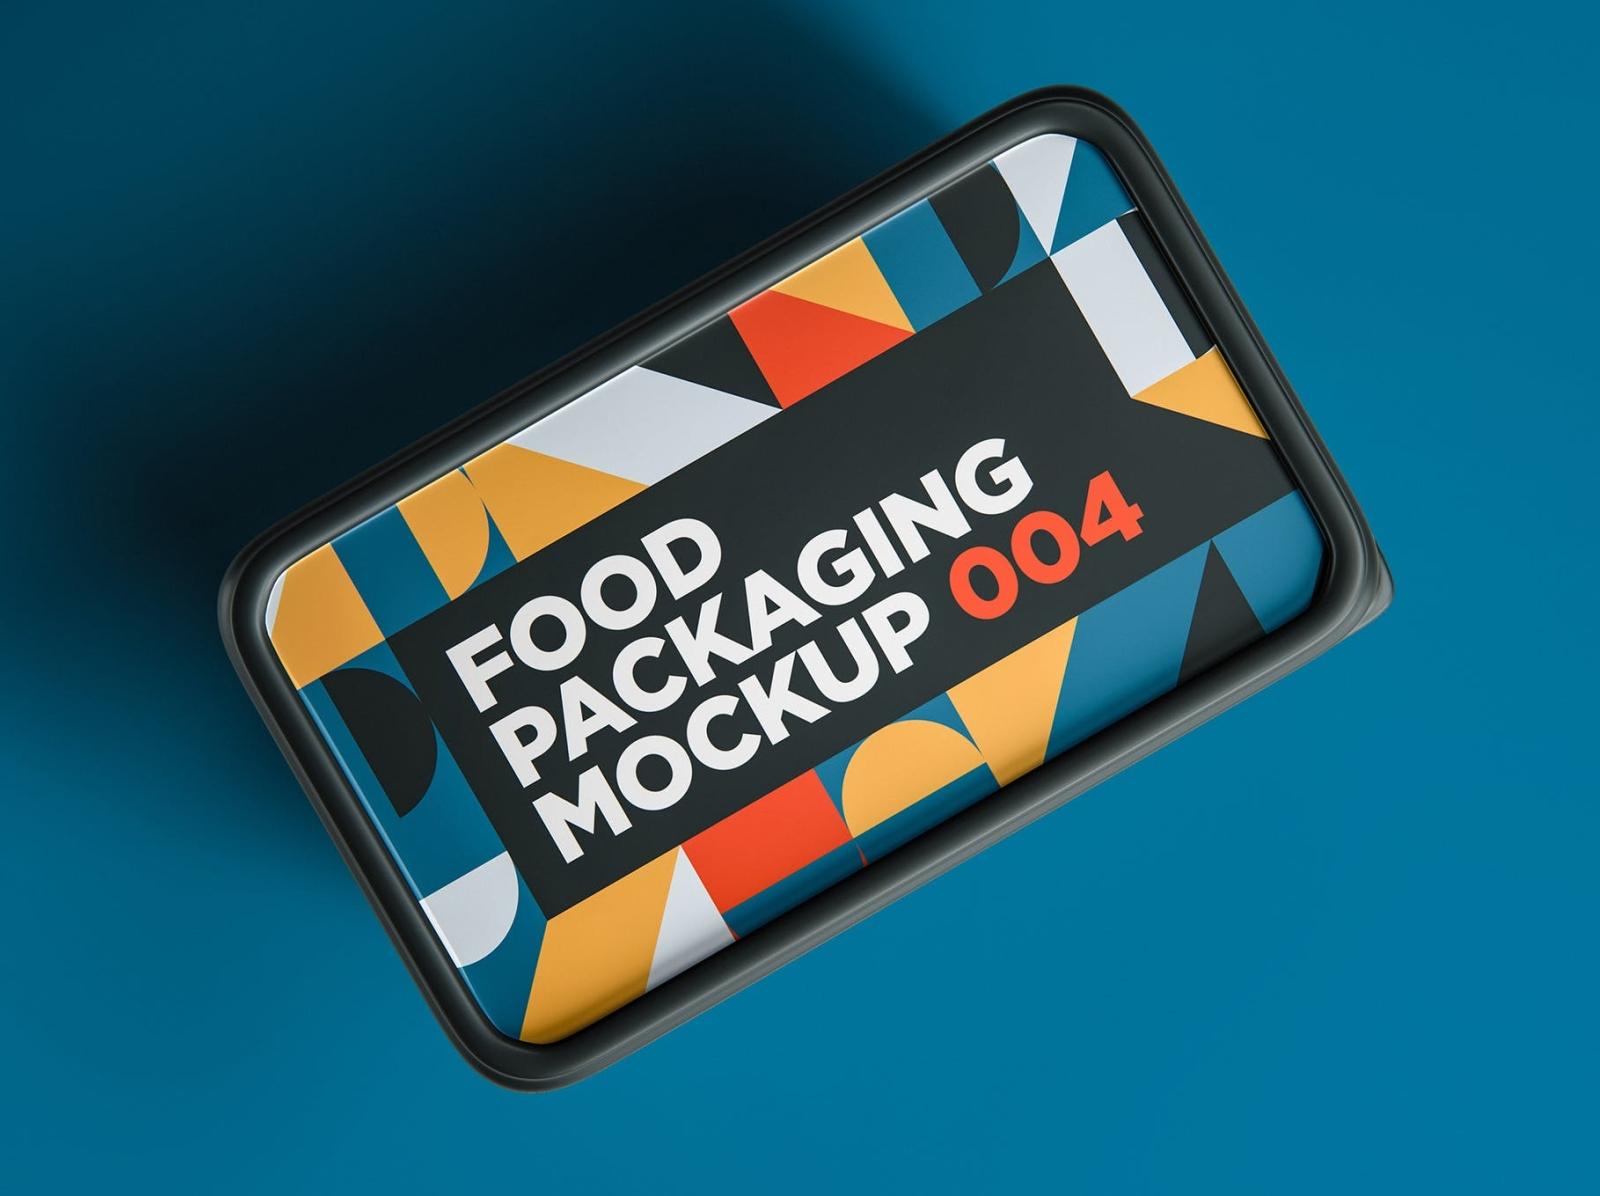 Food Packaging Box Mockup packaging design package design food box mockup package packaging food typography ux vector ui 3d logo illustration graphic design design branding